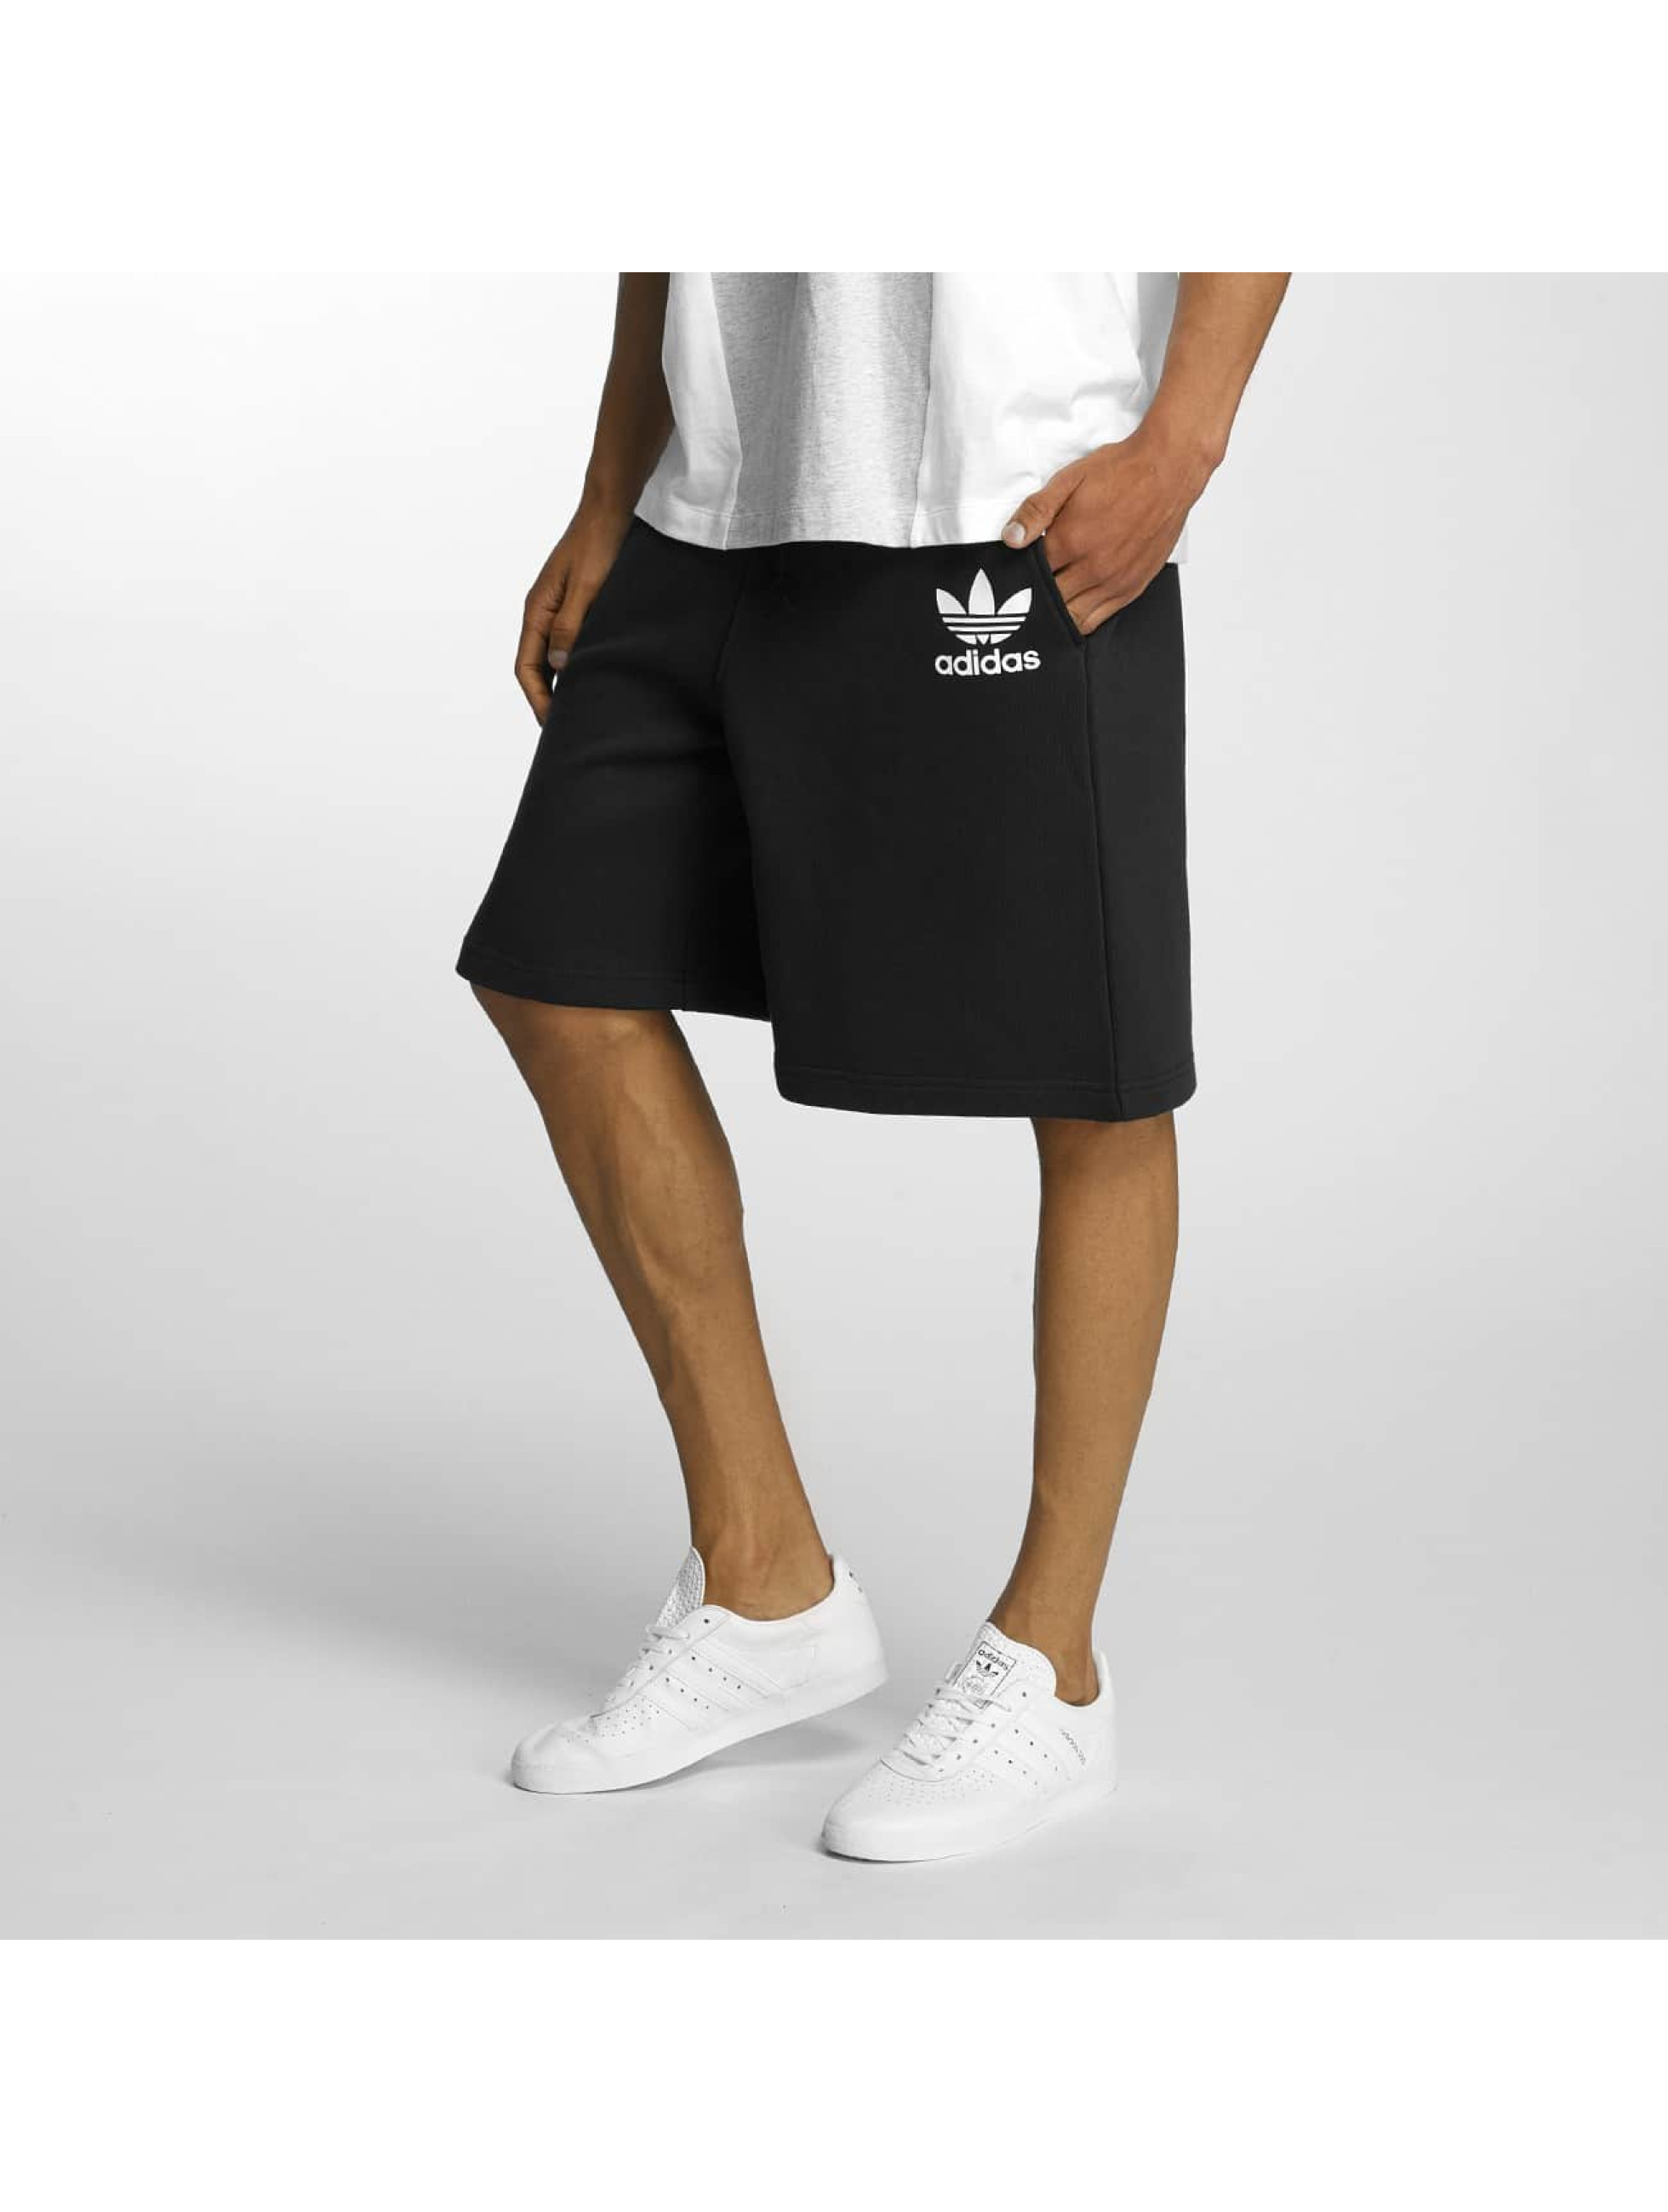 adidas originals Shorts ADC F schwarz